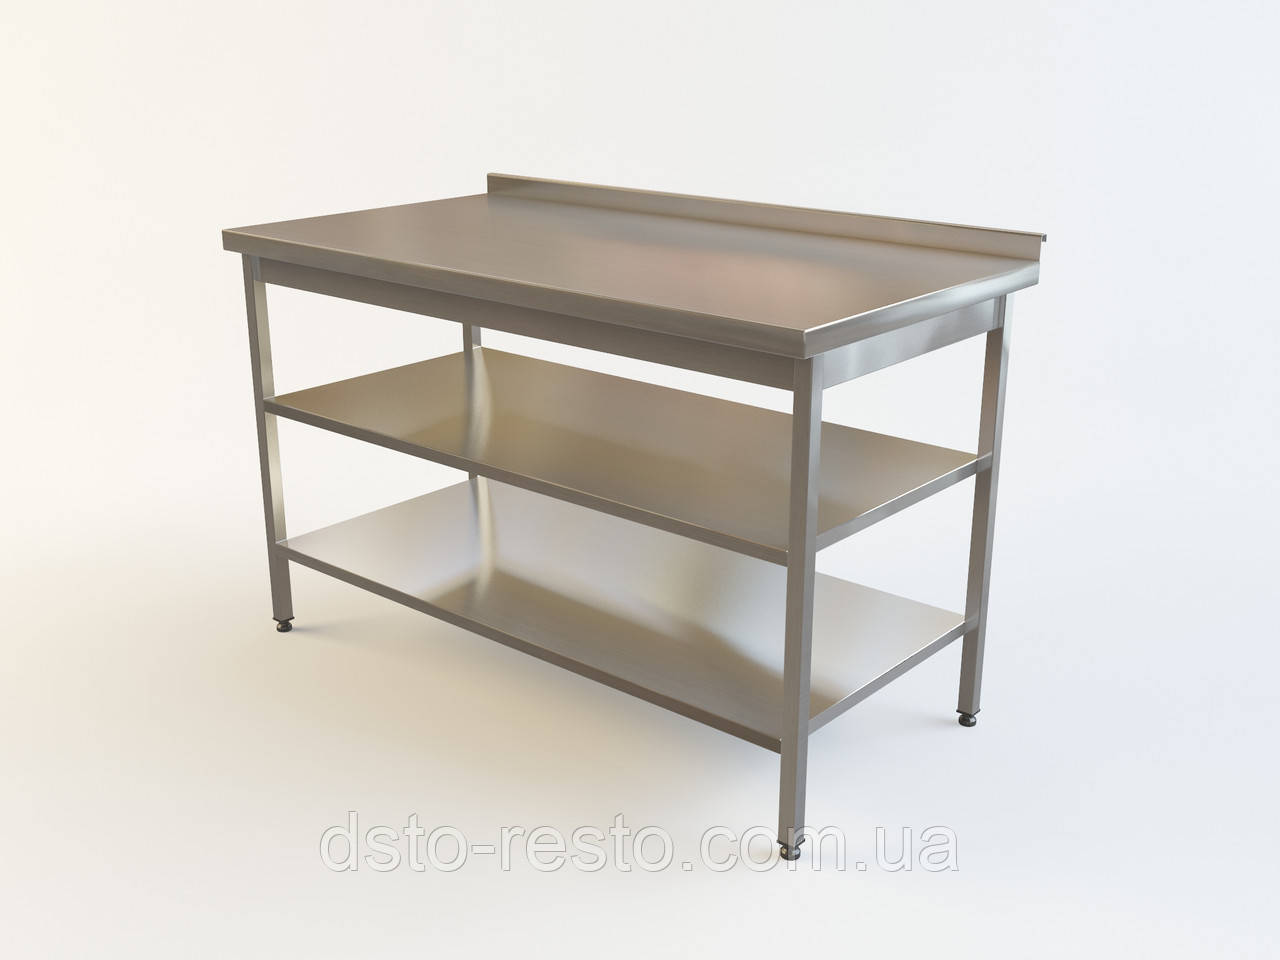 Стол для кухни ресторана с 2-мя полками 1500/600/850 мм